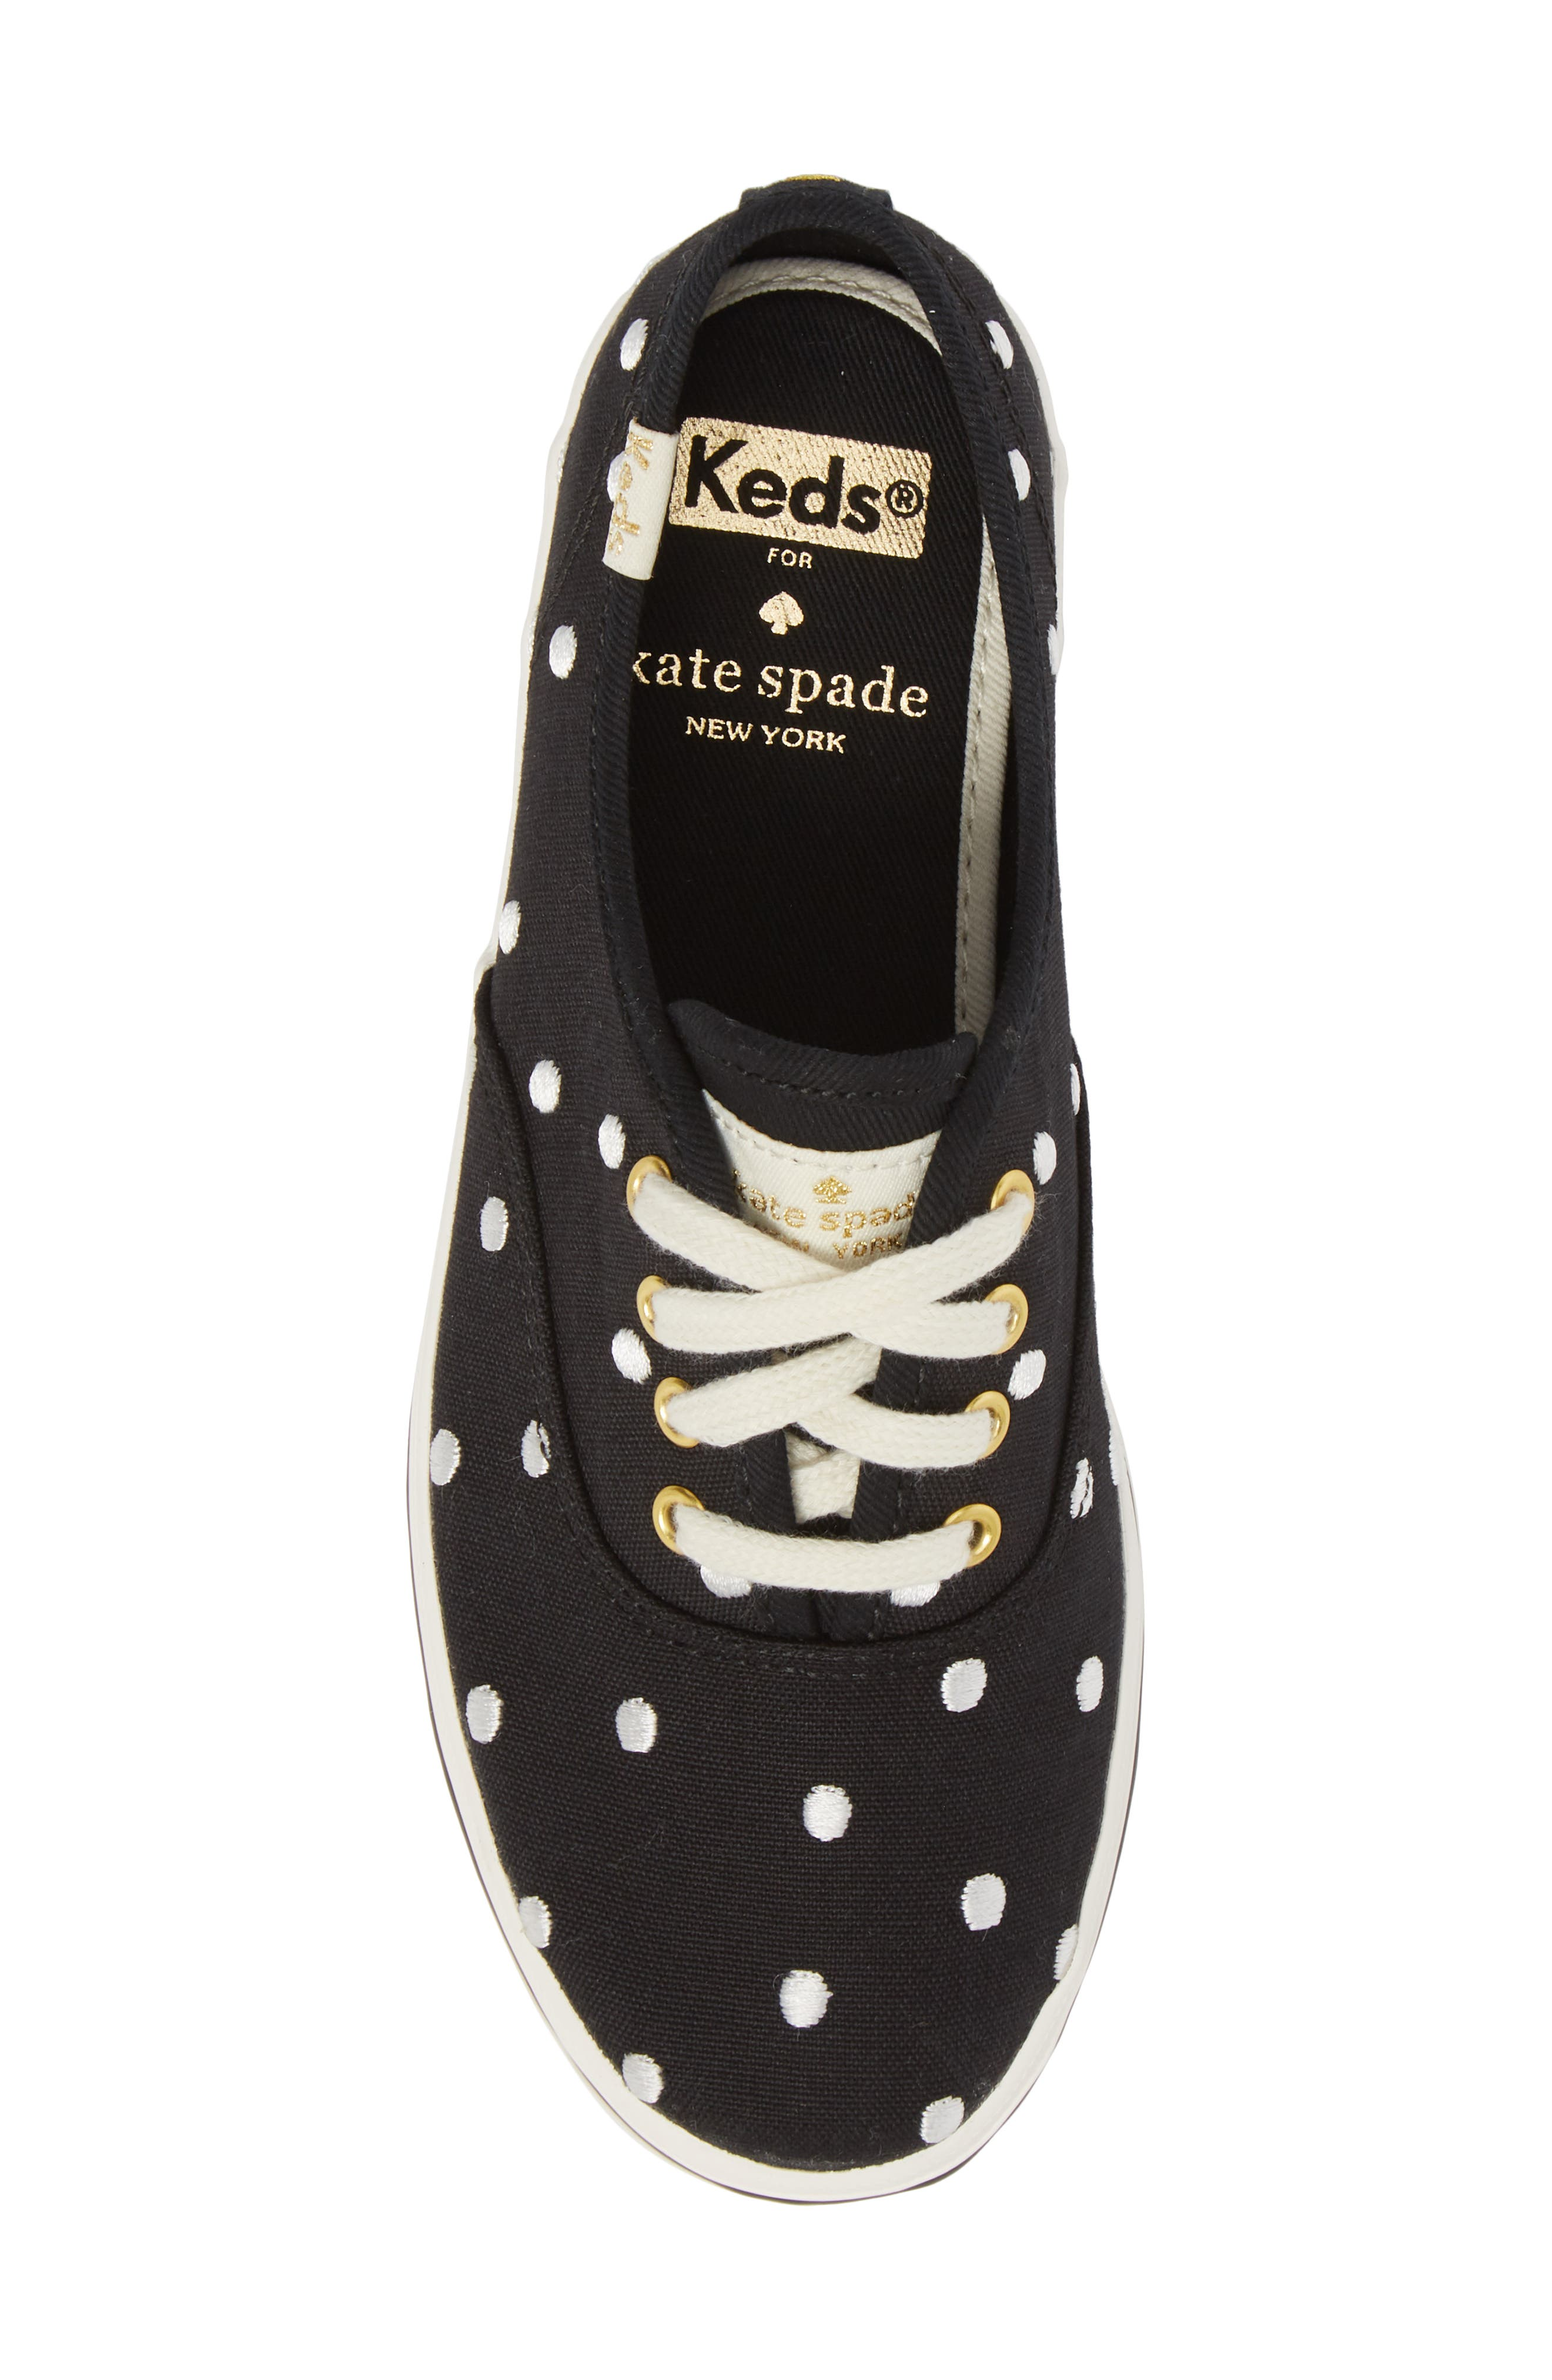 x kate spade new york champion polka dot lace-up shoe,                             Alternate thumbnail 5, color,                             BLACK DANCING DOT